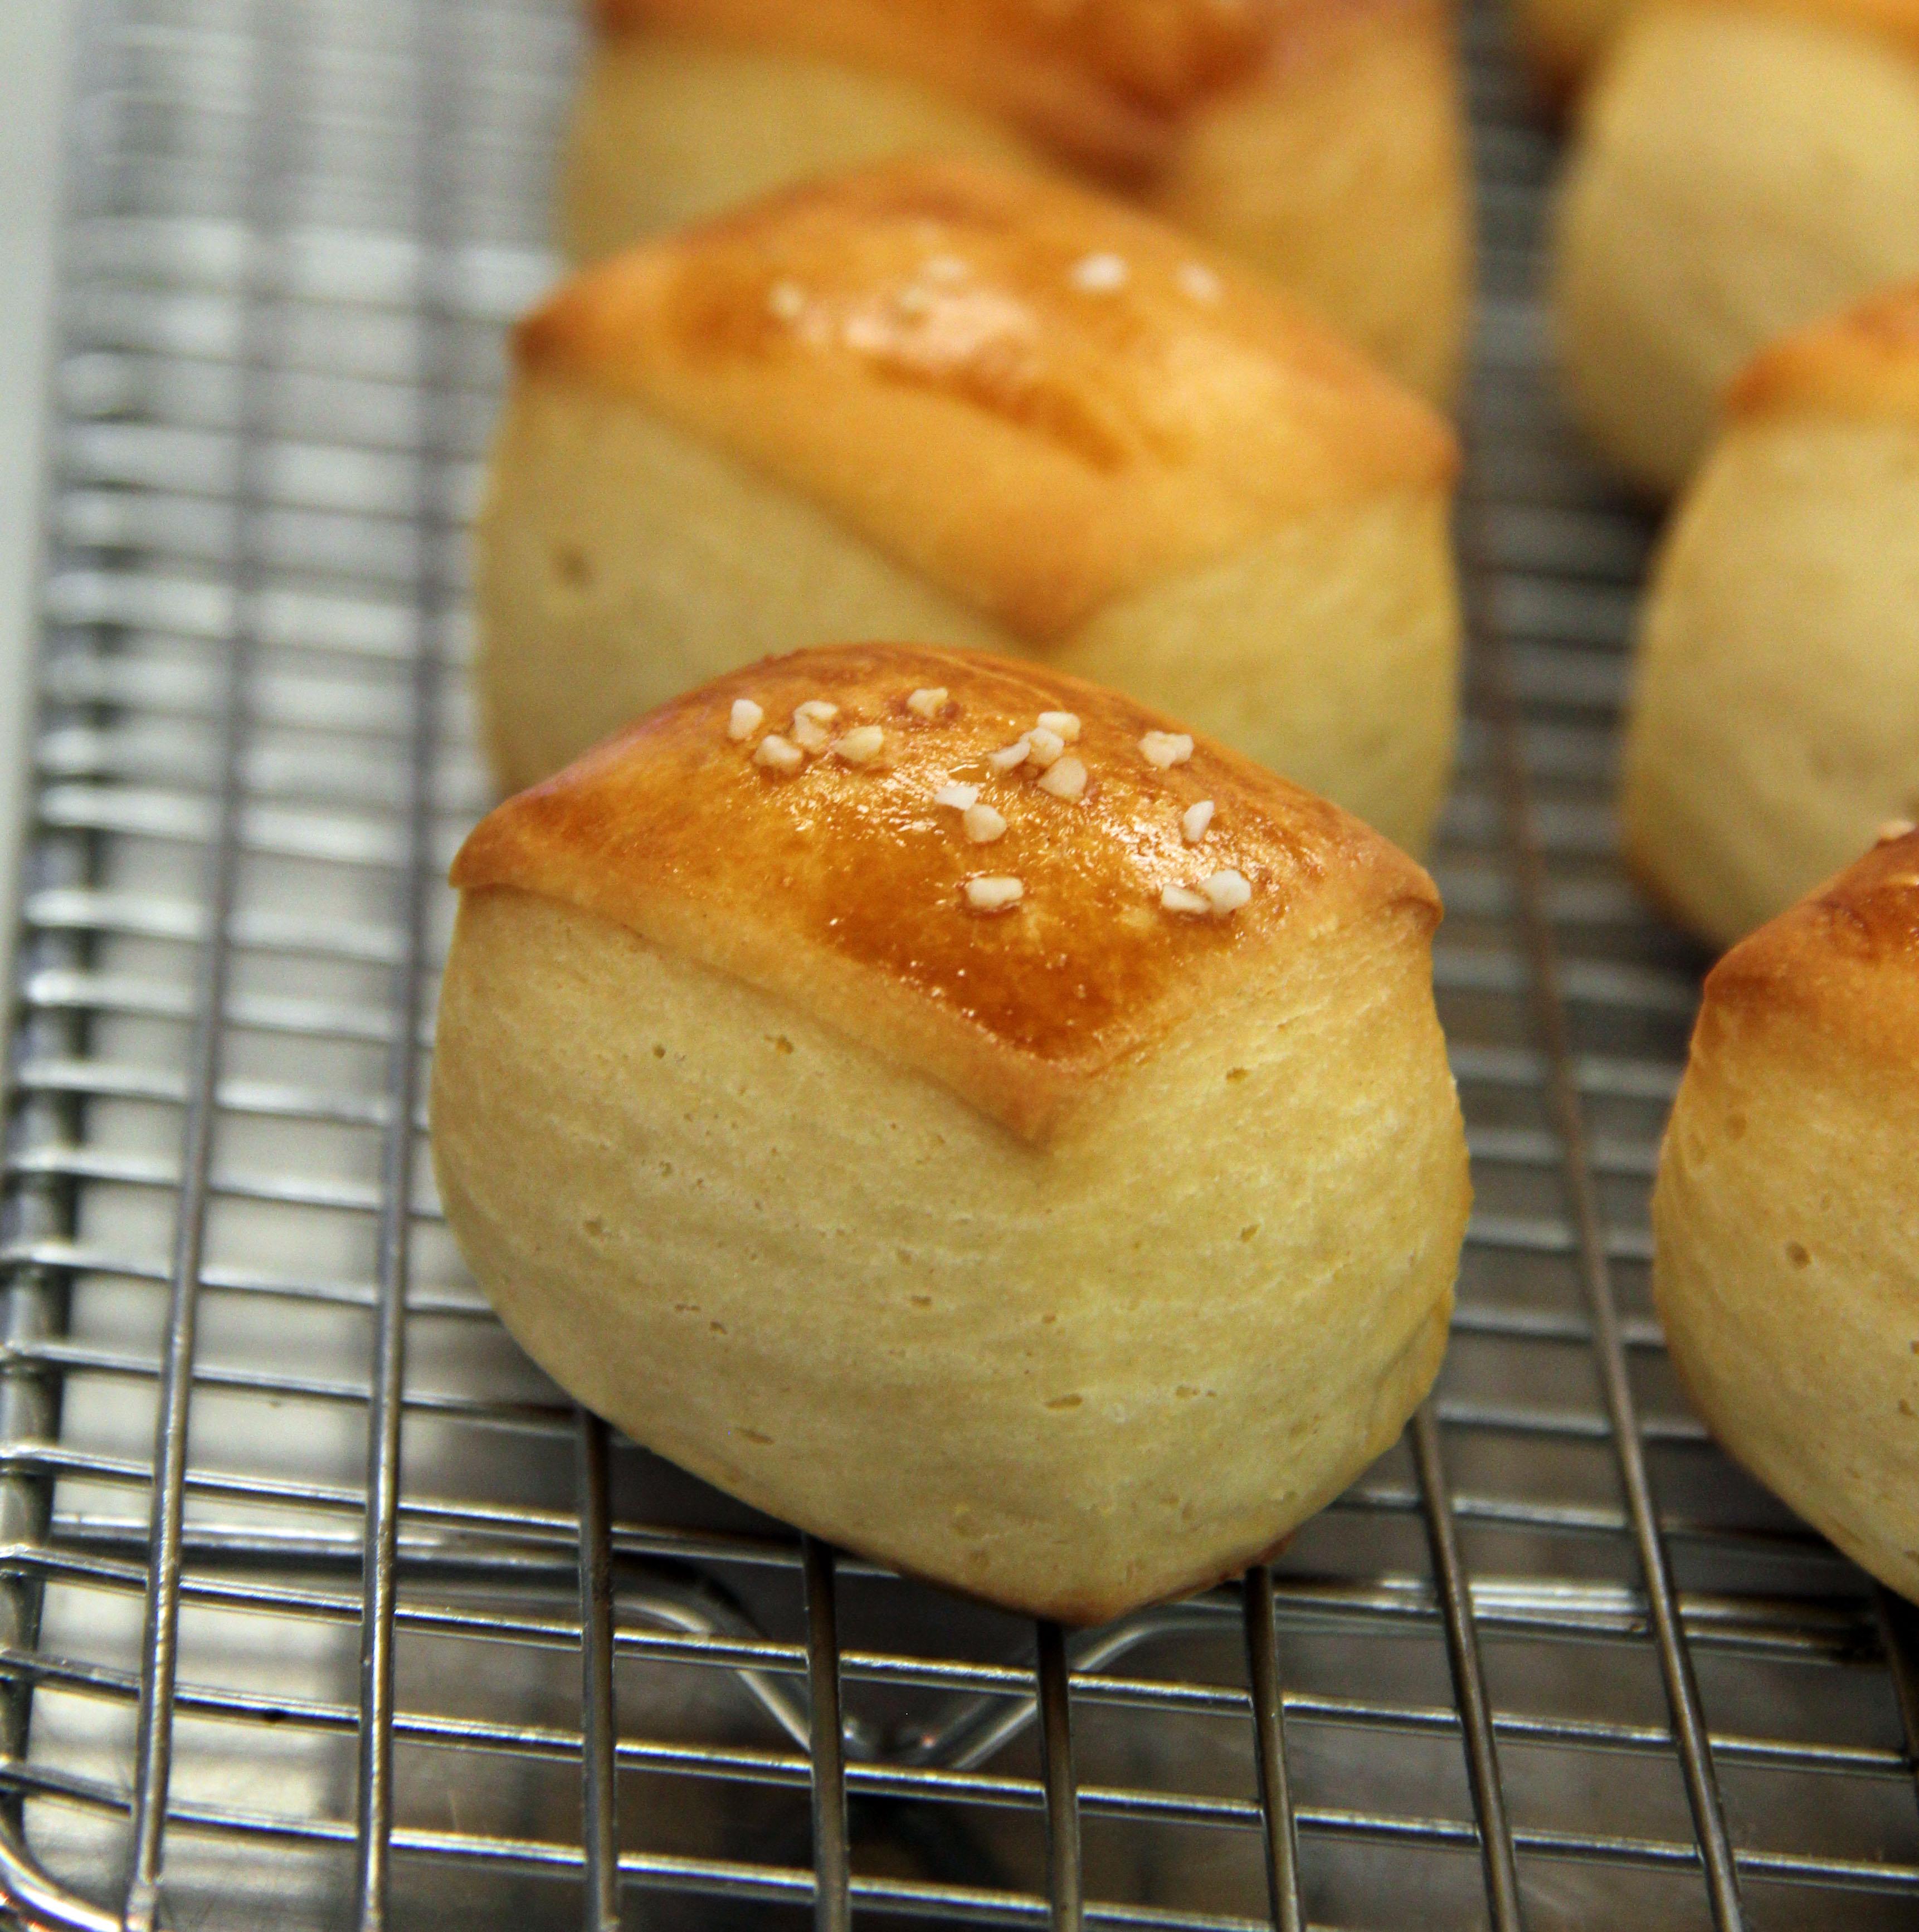 ... pain au chocolat cinnamon rolls with crème fraîche icing and walnuts